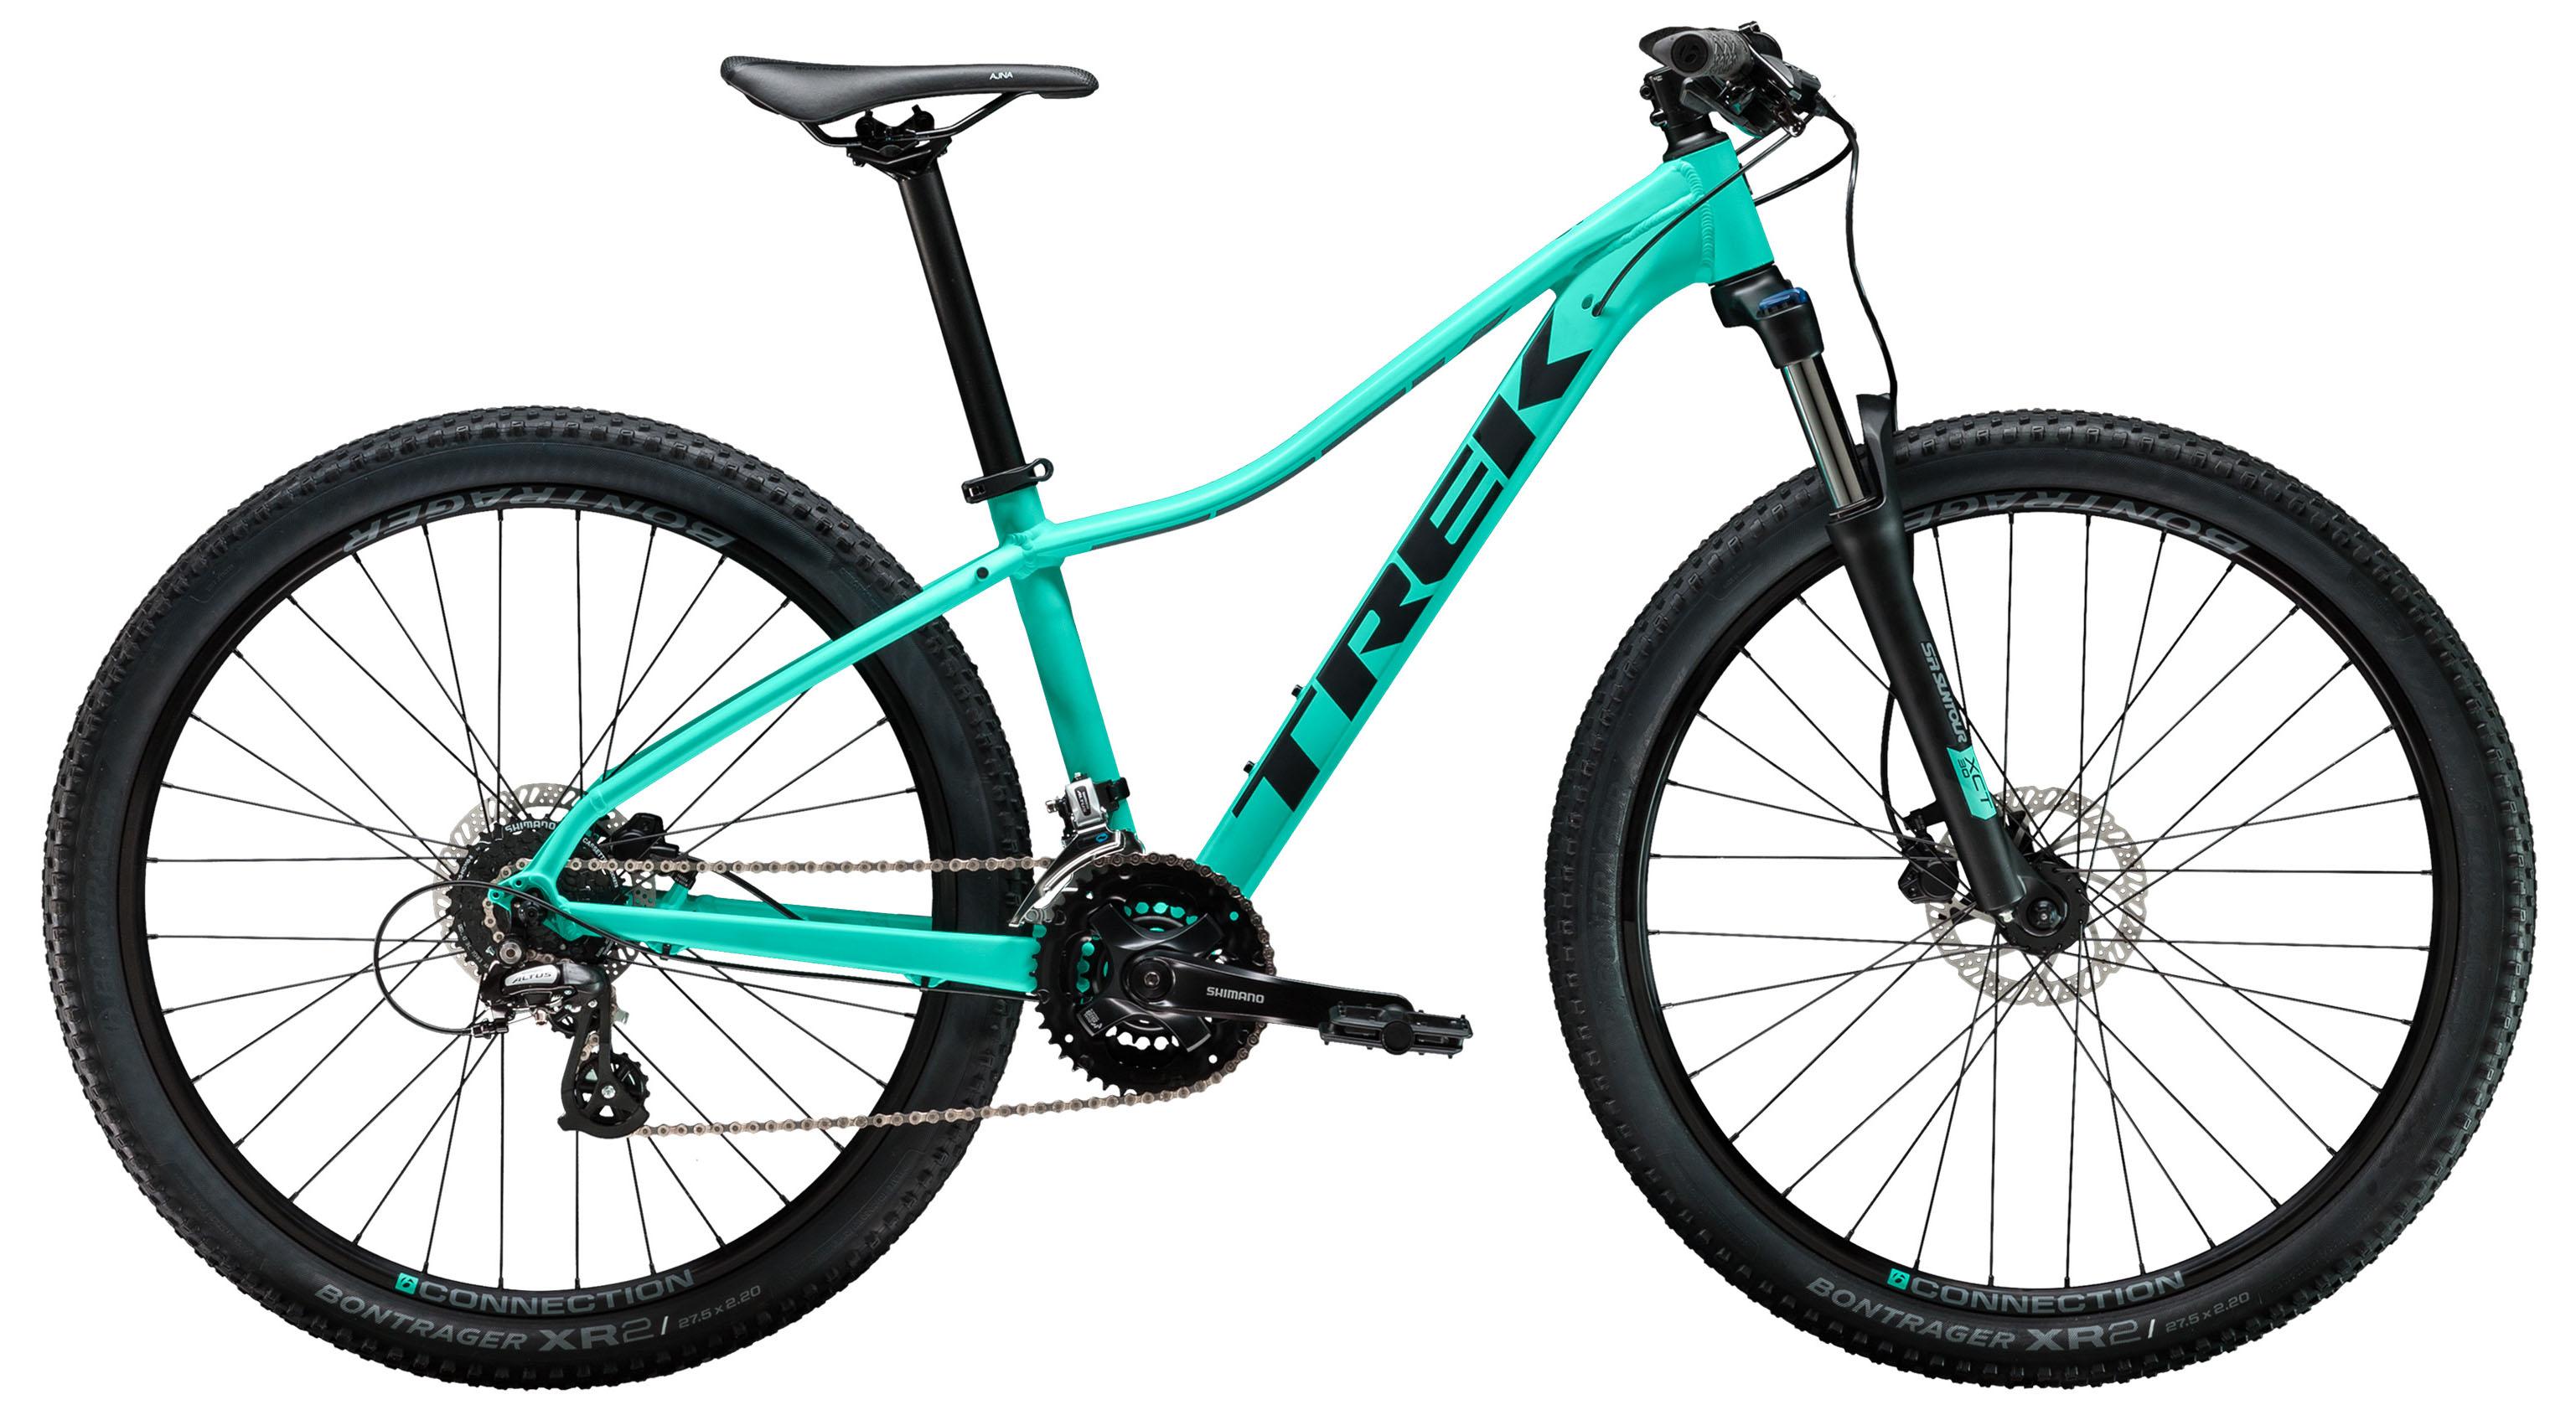 Велосипед Trek Marlin 6 29 Womens 2019 цены онлайн